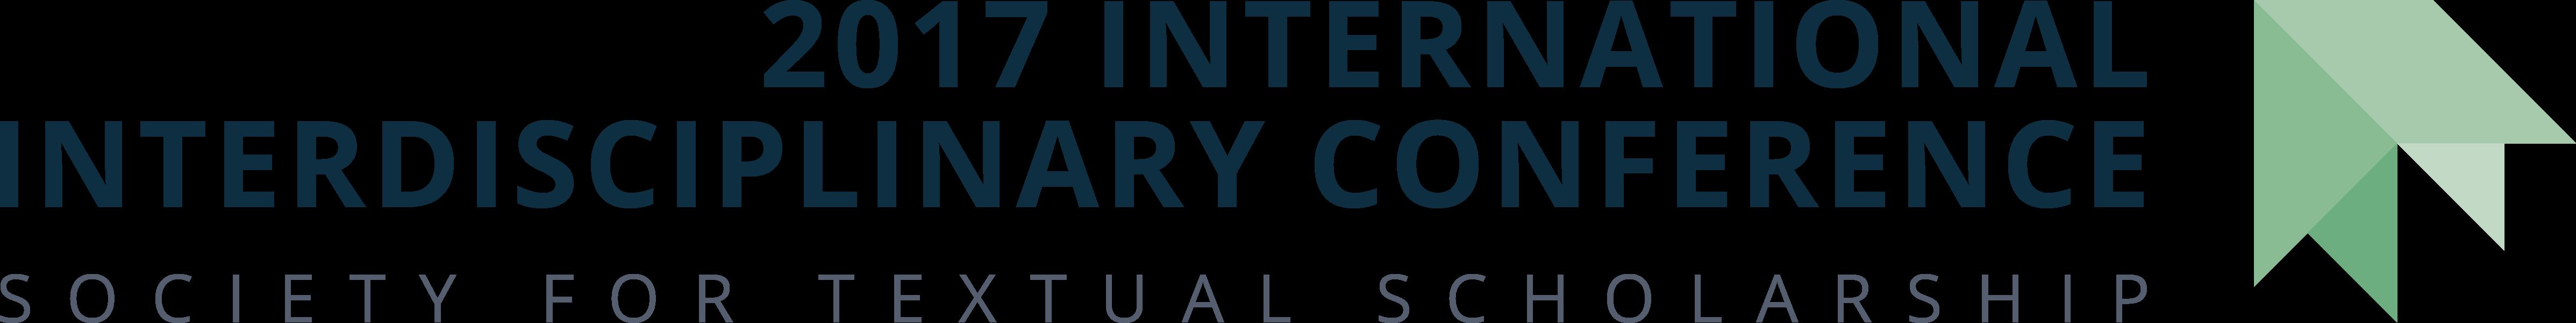 2017 International Interdisciplinary Conference: Society for Textual Scholarship